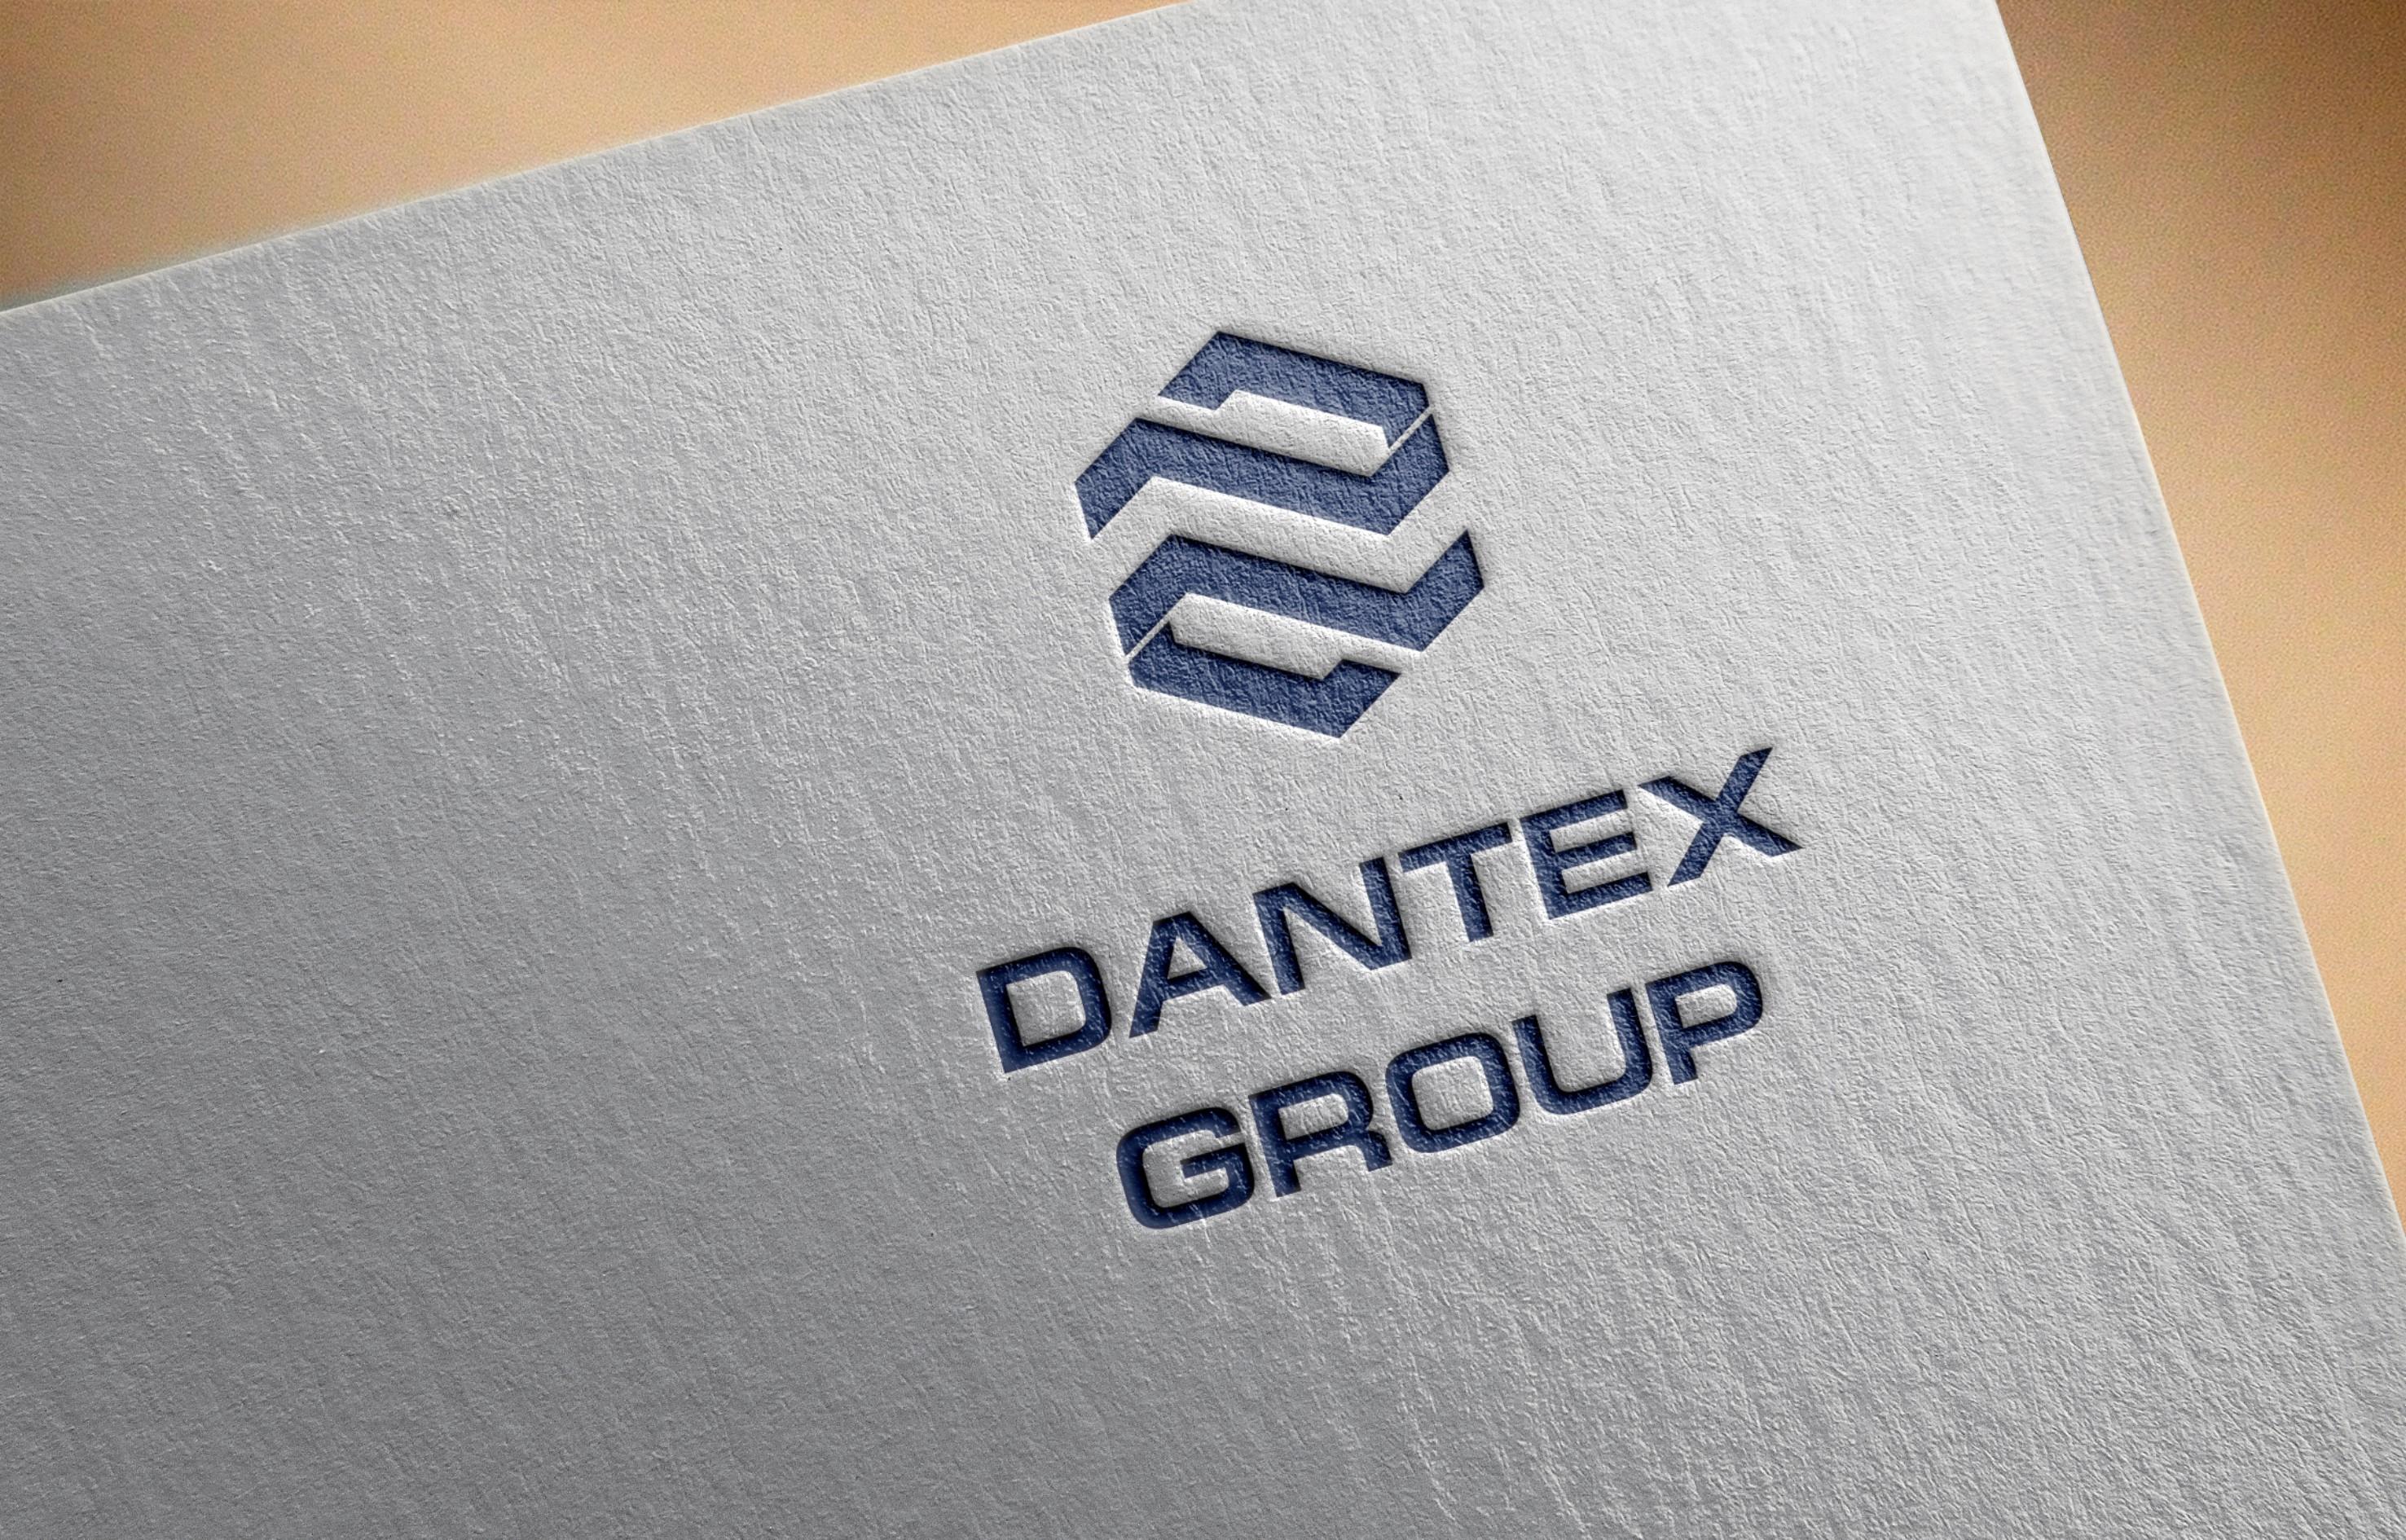 Конкурс на разработку логотипа для компании Dantex Group  фото f_2725bffe7508e153.jpg